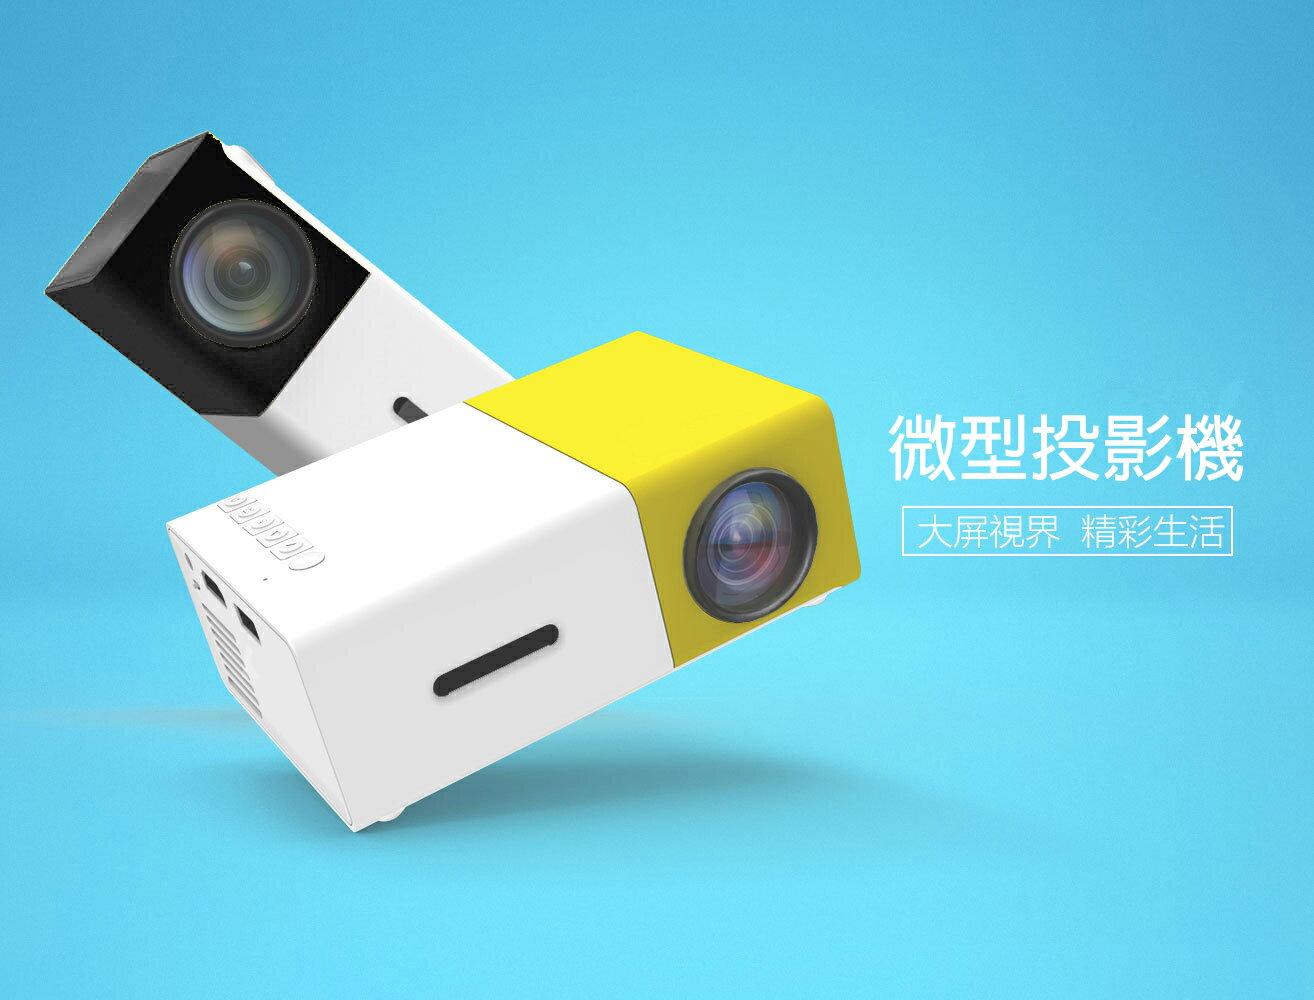 @Woori 3c@ Gopro投影機版,微型投影機,迷你攜帶方便,支援HDMI輸入,隨身碟播放,迷你投影機,手機投影 (白/黃配色)  &#8221; title=&#8221;    @Woori 3c@ Gopro投影機版,微型投影機,迷你攜帶方便,支援HDMI輸入,隨身碟播放,迷你投影機,手機投影 (白/黃配色)  &#8220;></a></p> <h2><strong><a href=